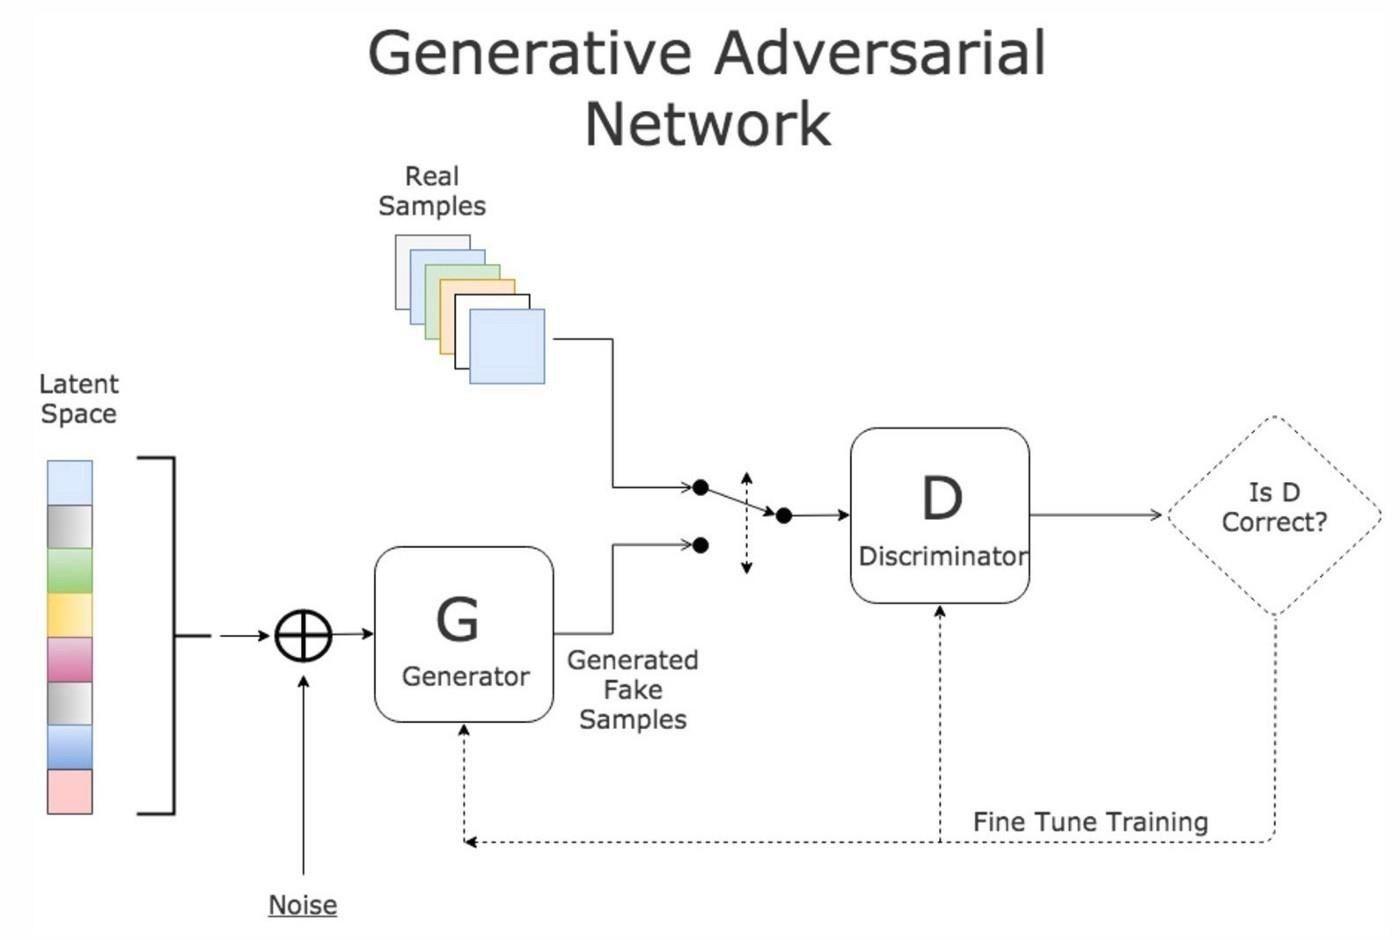 Crack Password Using AI with PassHemorrhage